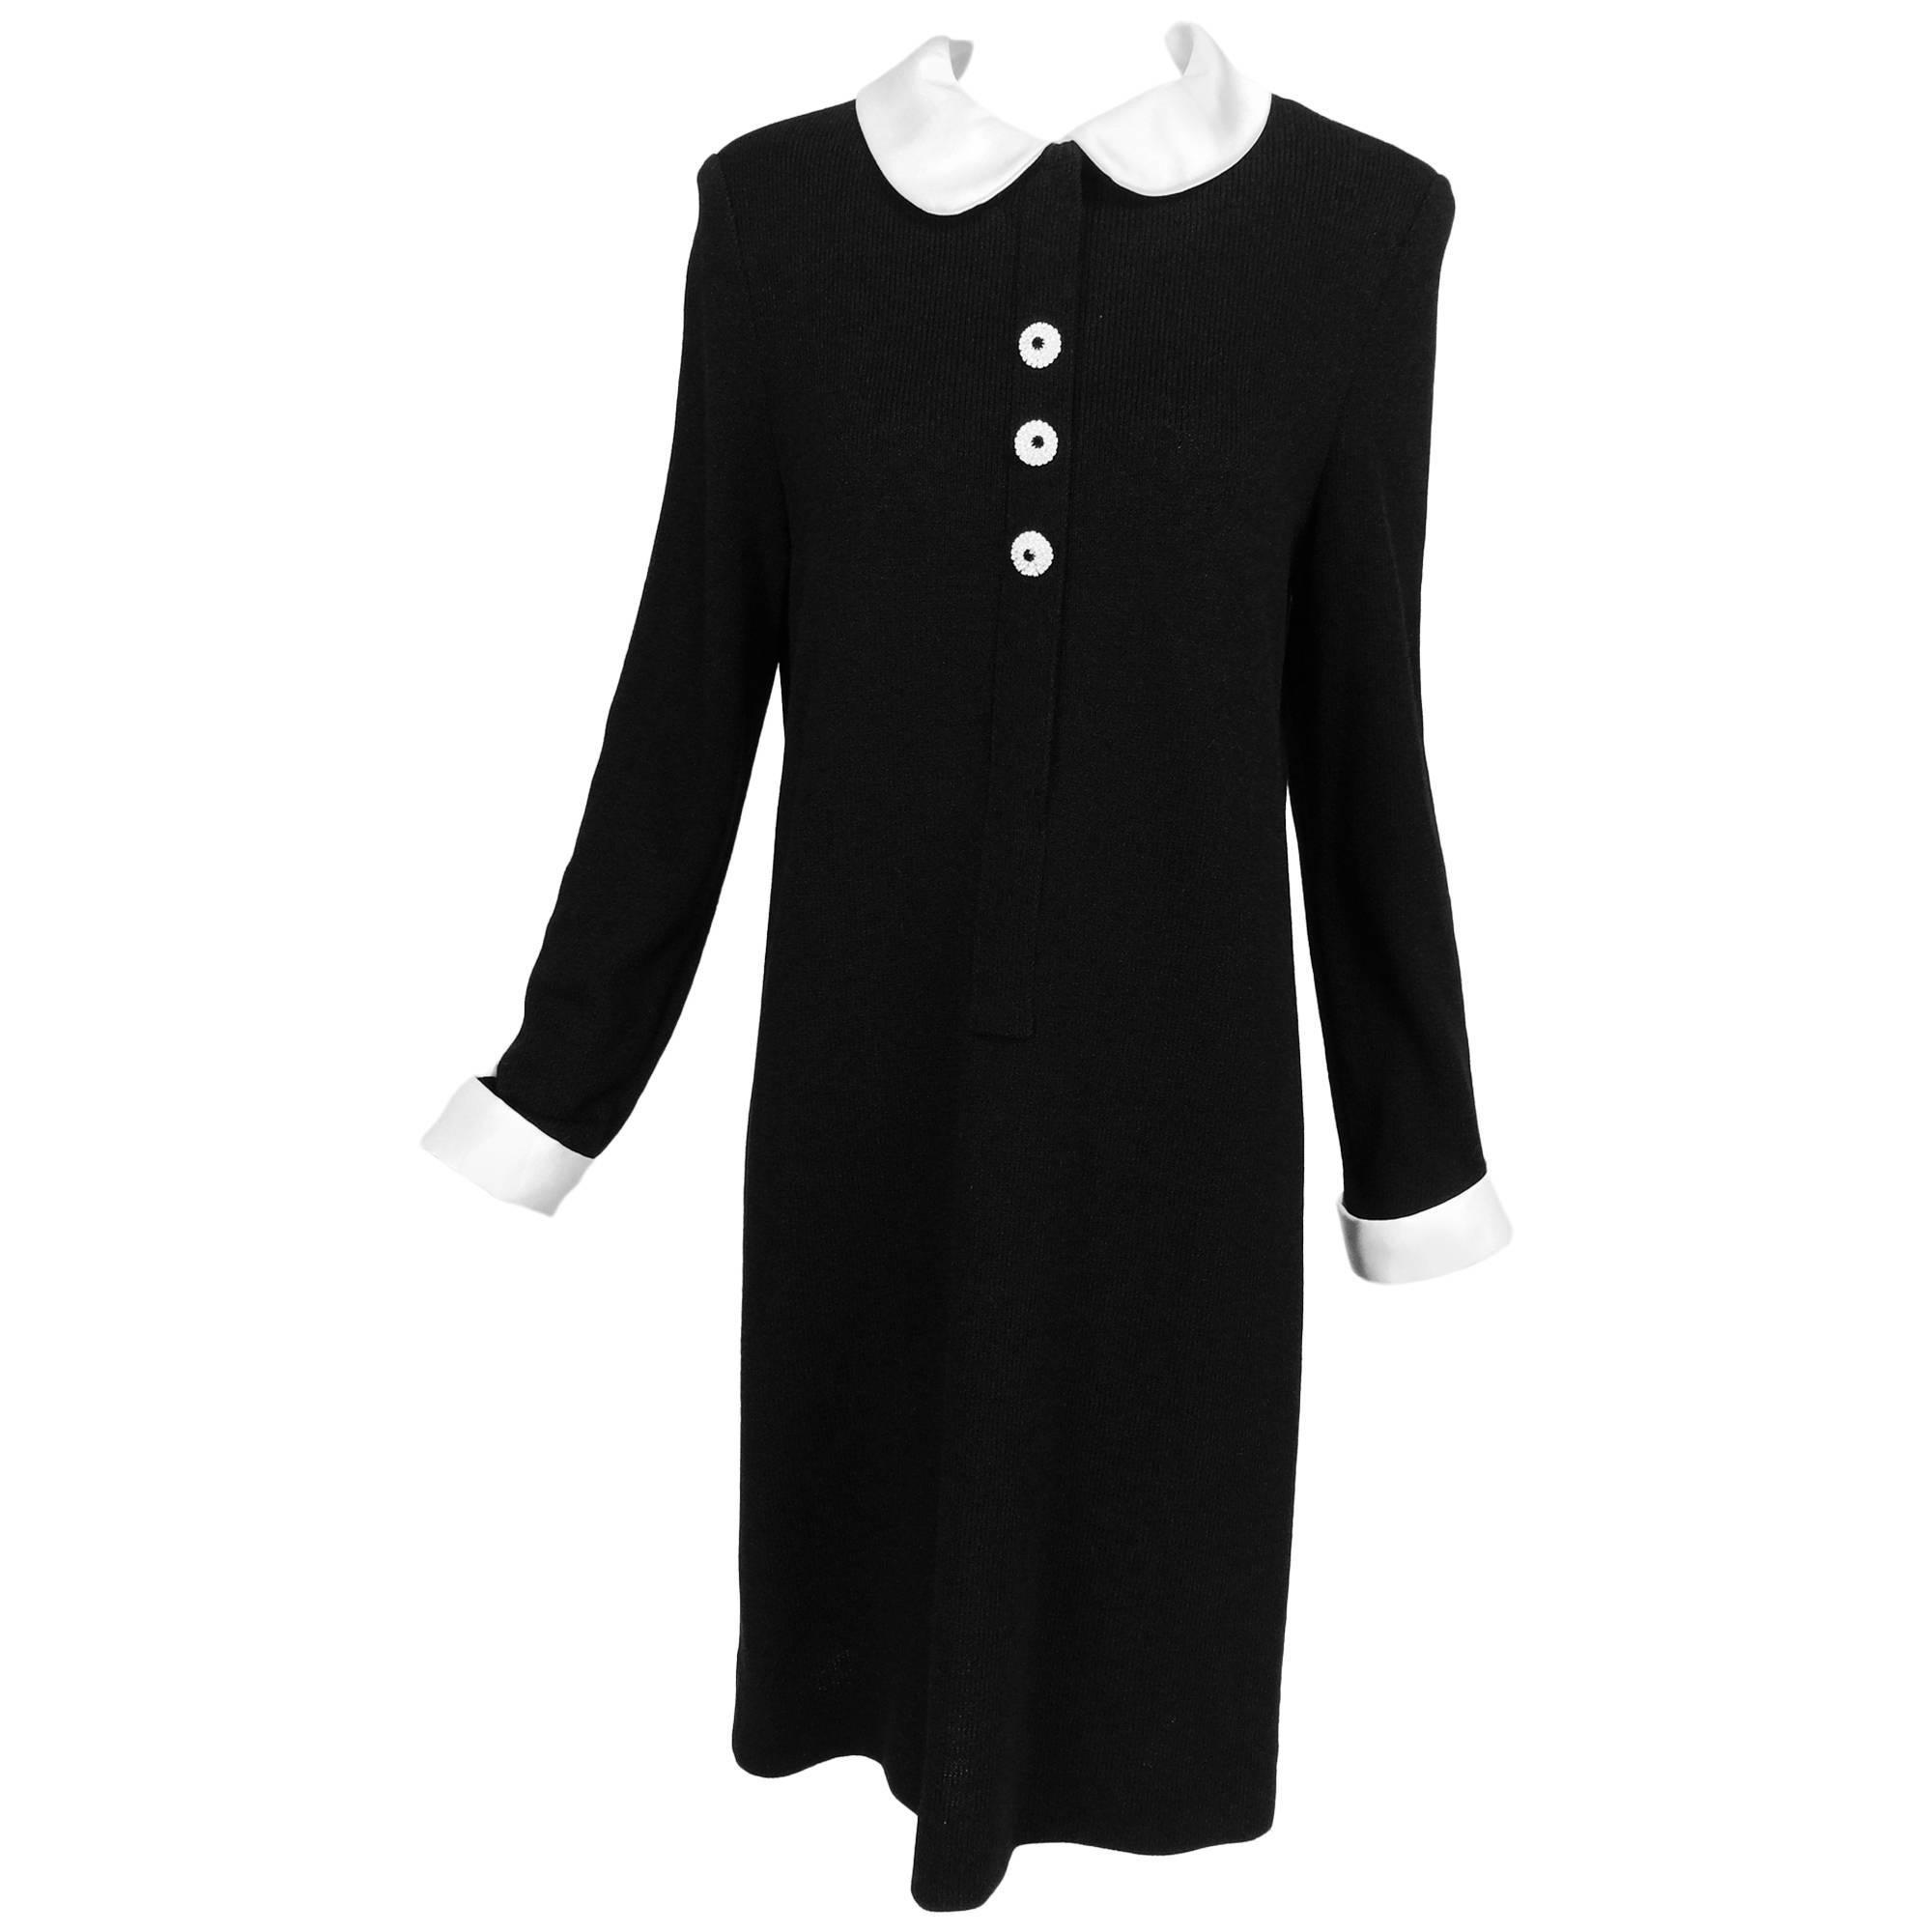 Adolfo black knit A line dress with white satin collar & cuffs 1970s size 12